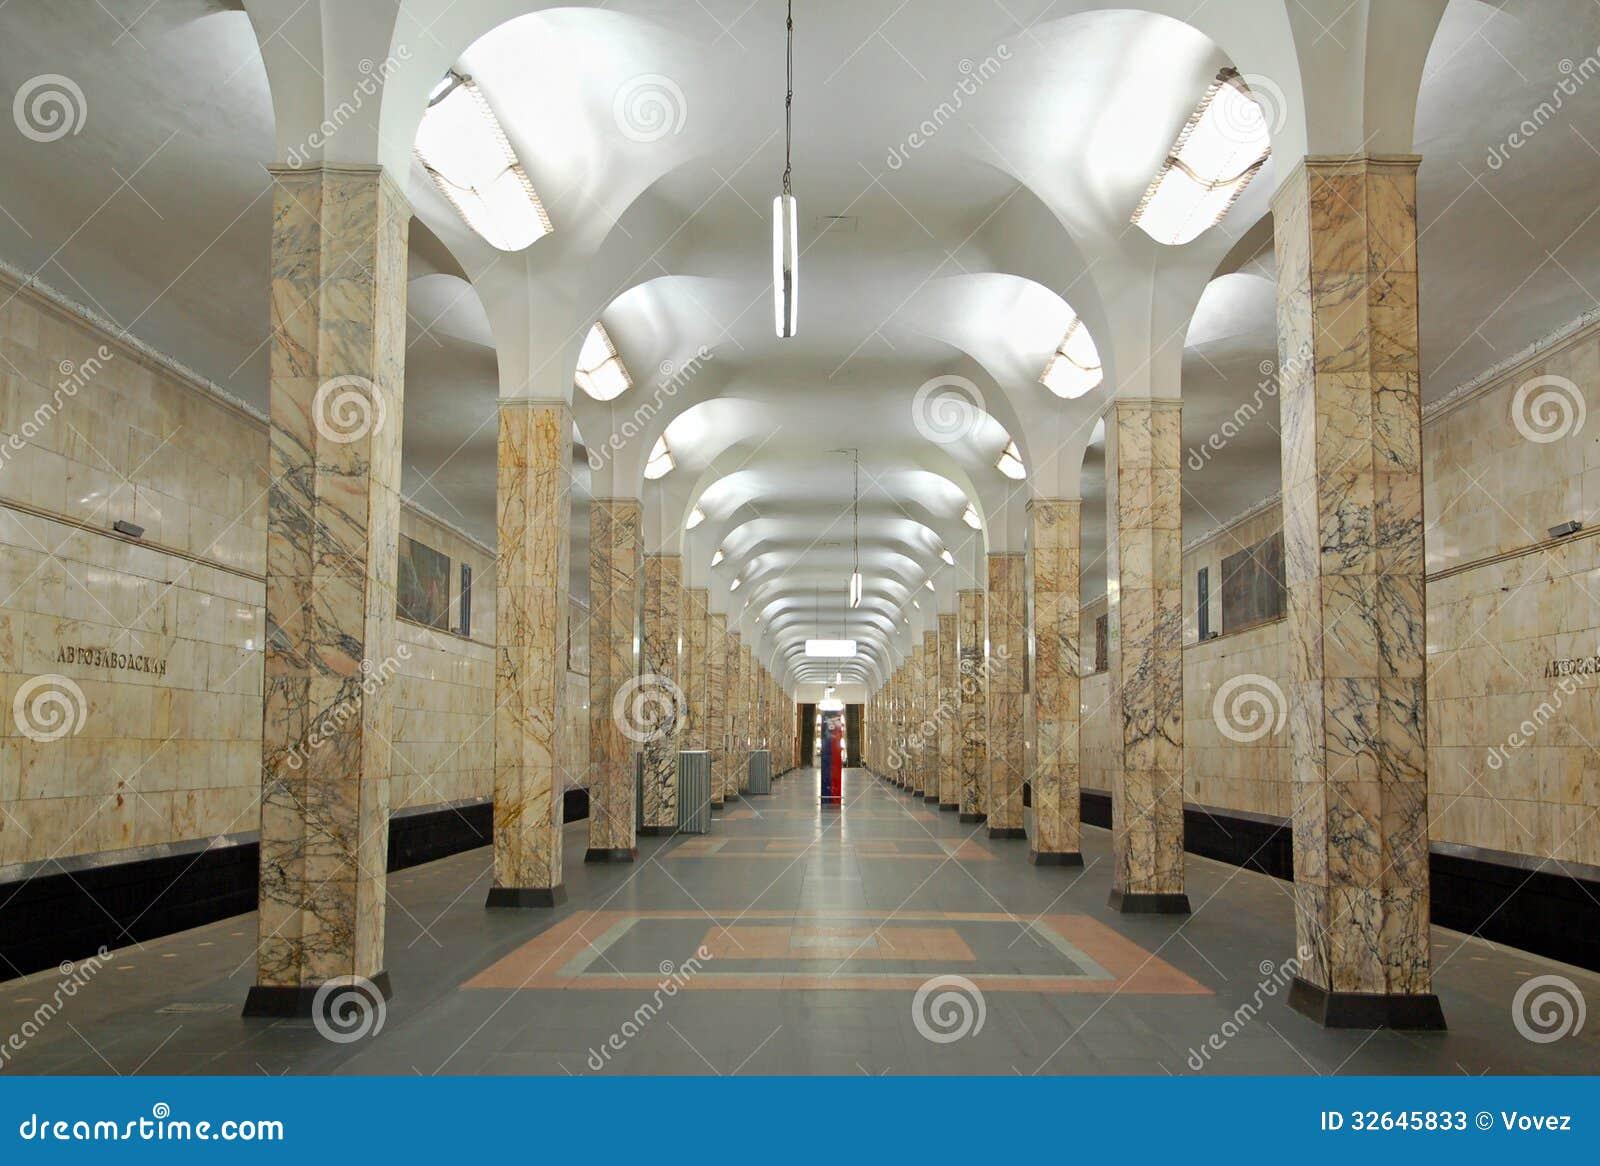 moscow metro interior of station avtozavodskaya stock photos image 32645833. Black Bedroom Furniture Sets. Home Design Ideas